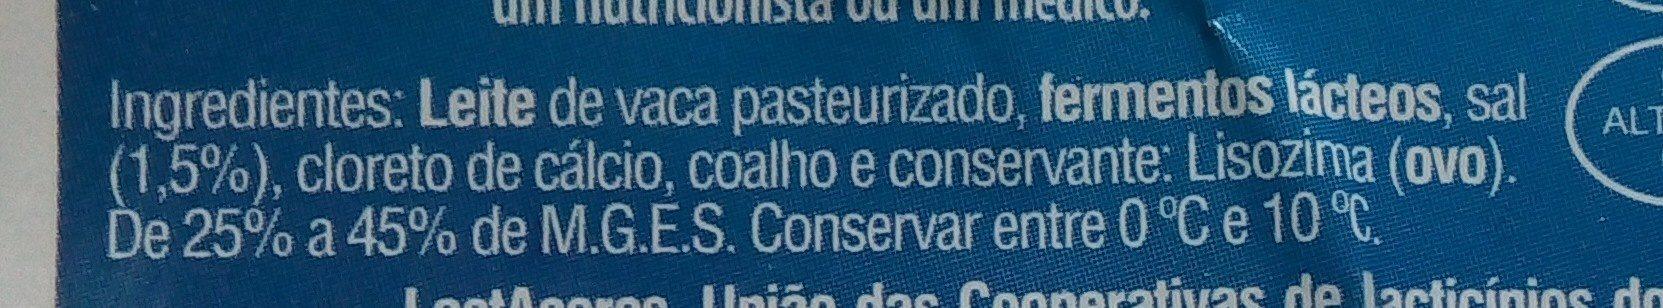 Queijo Flamengo Fatiado light - Ingredients - pt